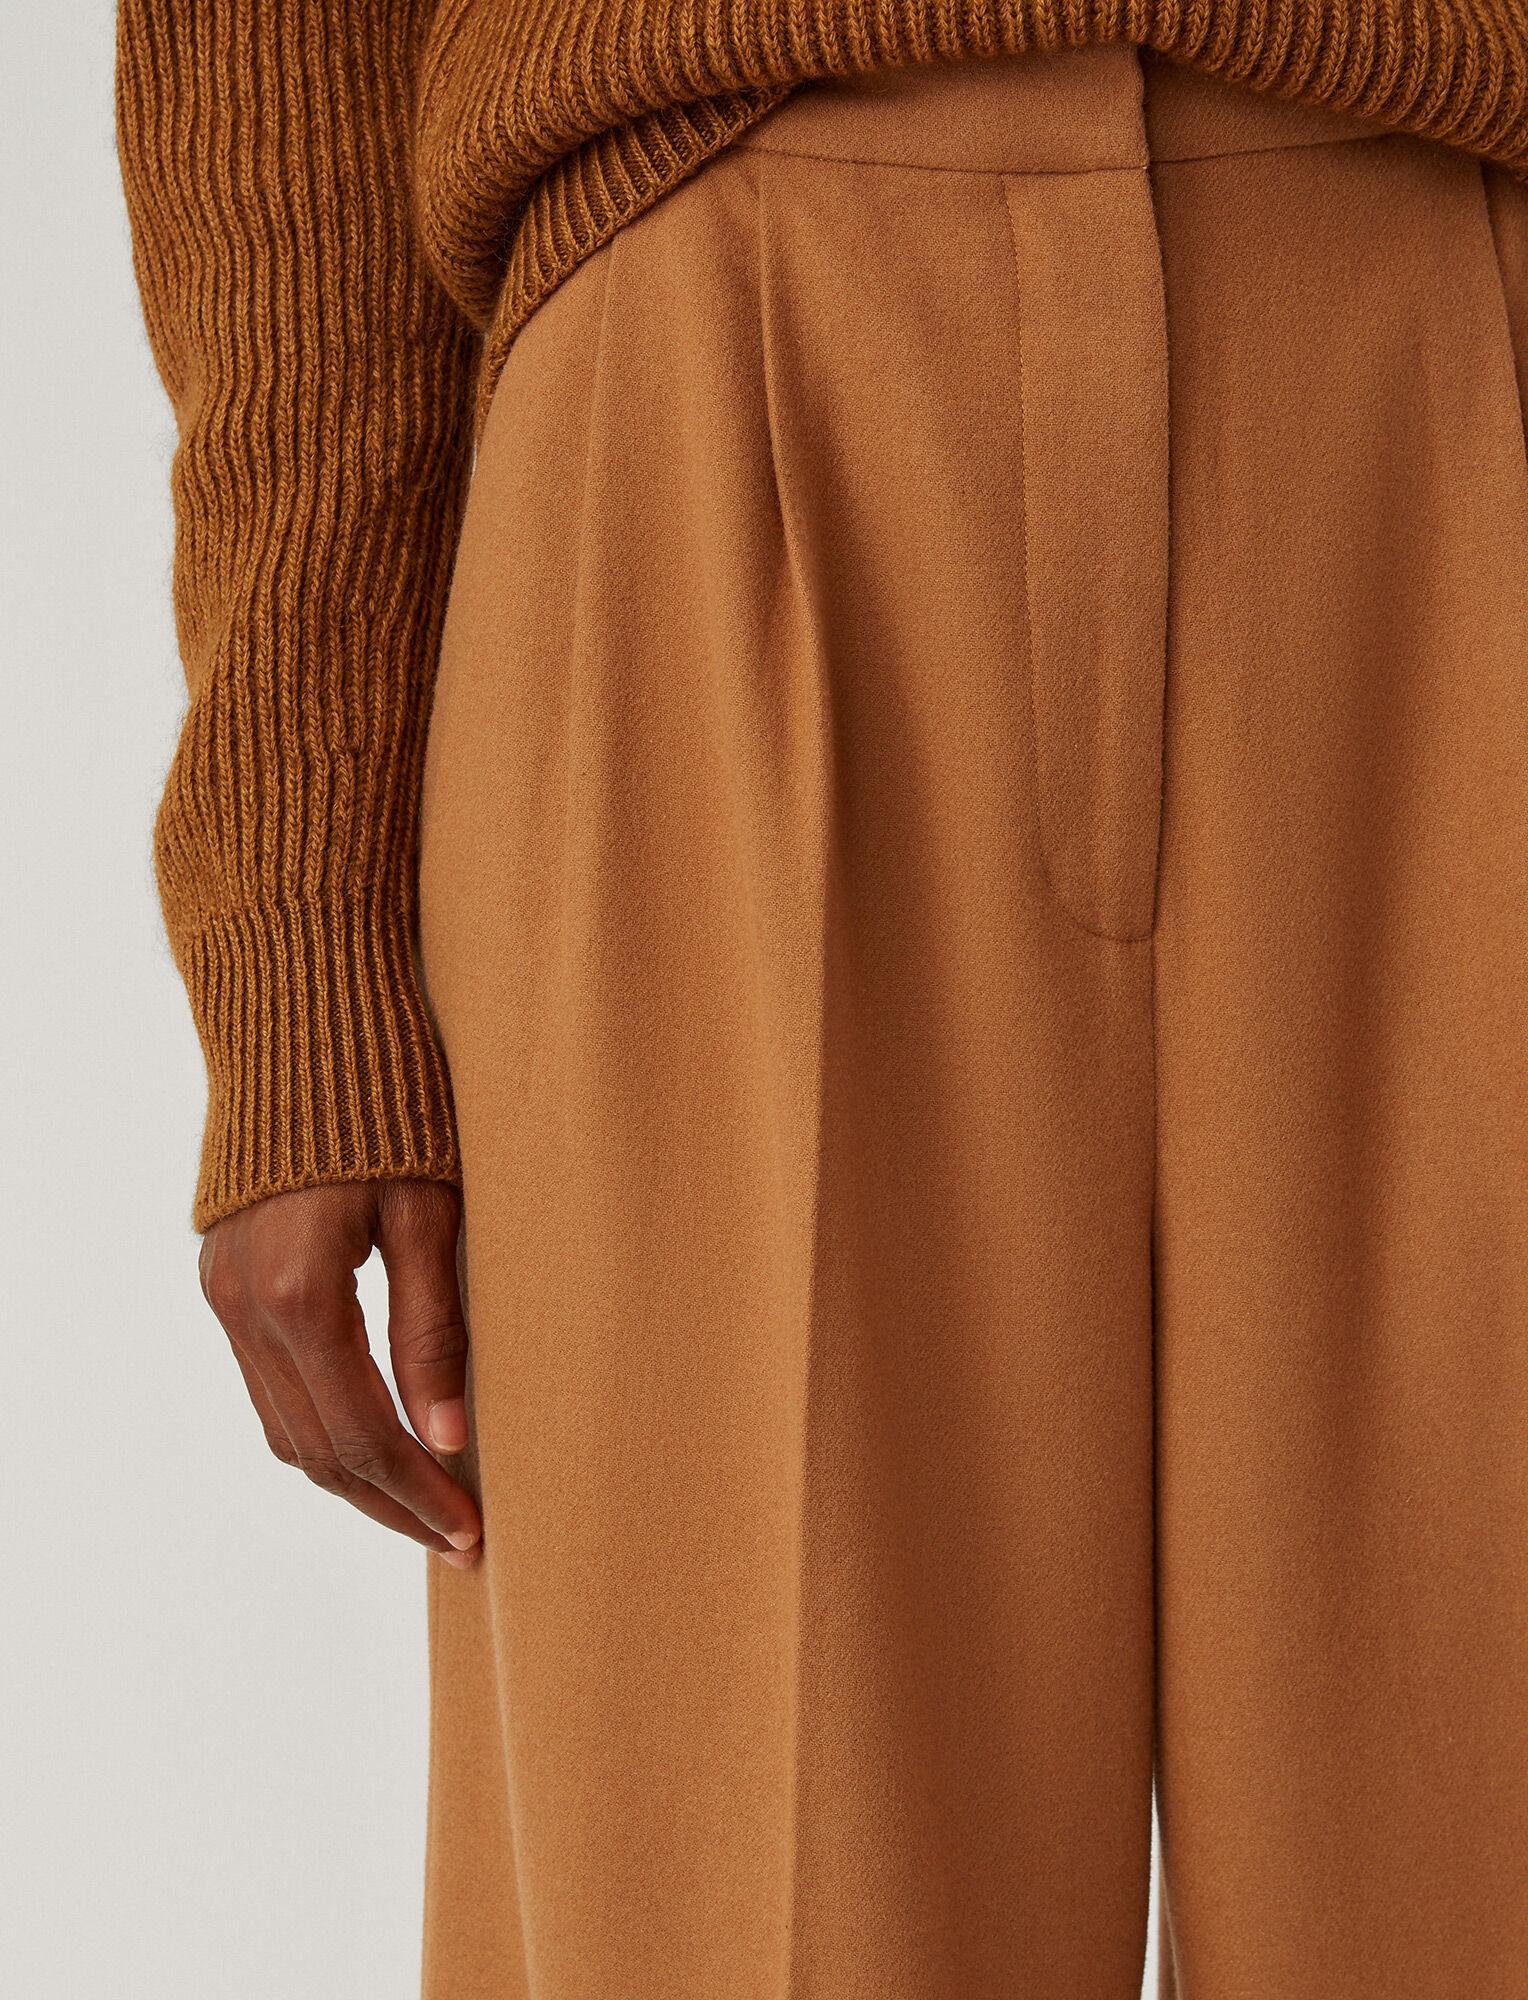 Joseph, Tima Silk Wool Flannel Trousers, in Sandalwood